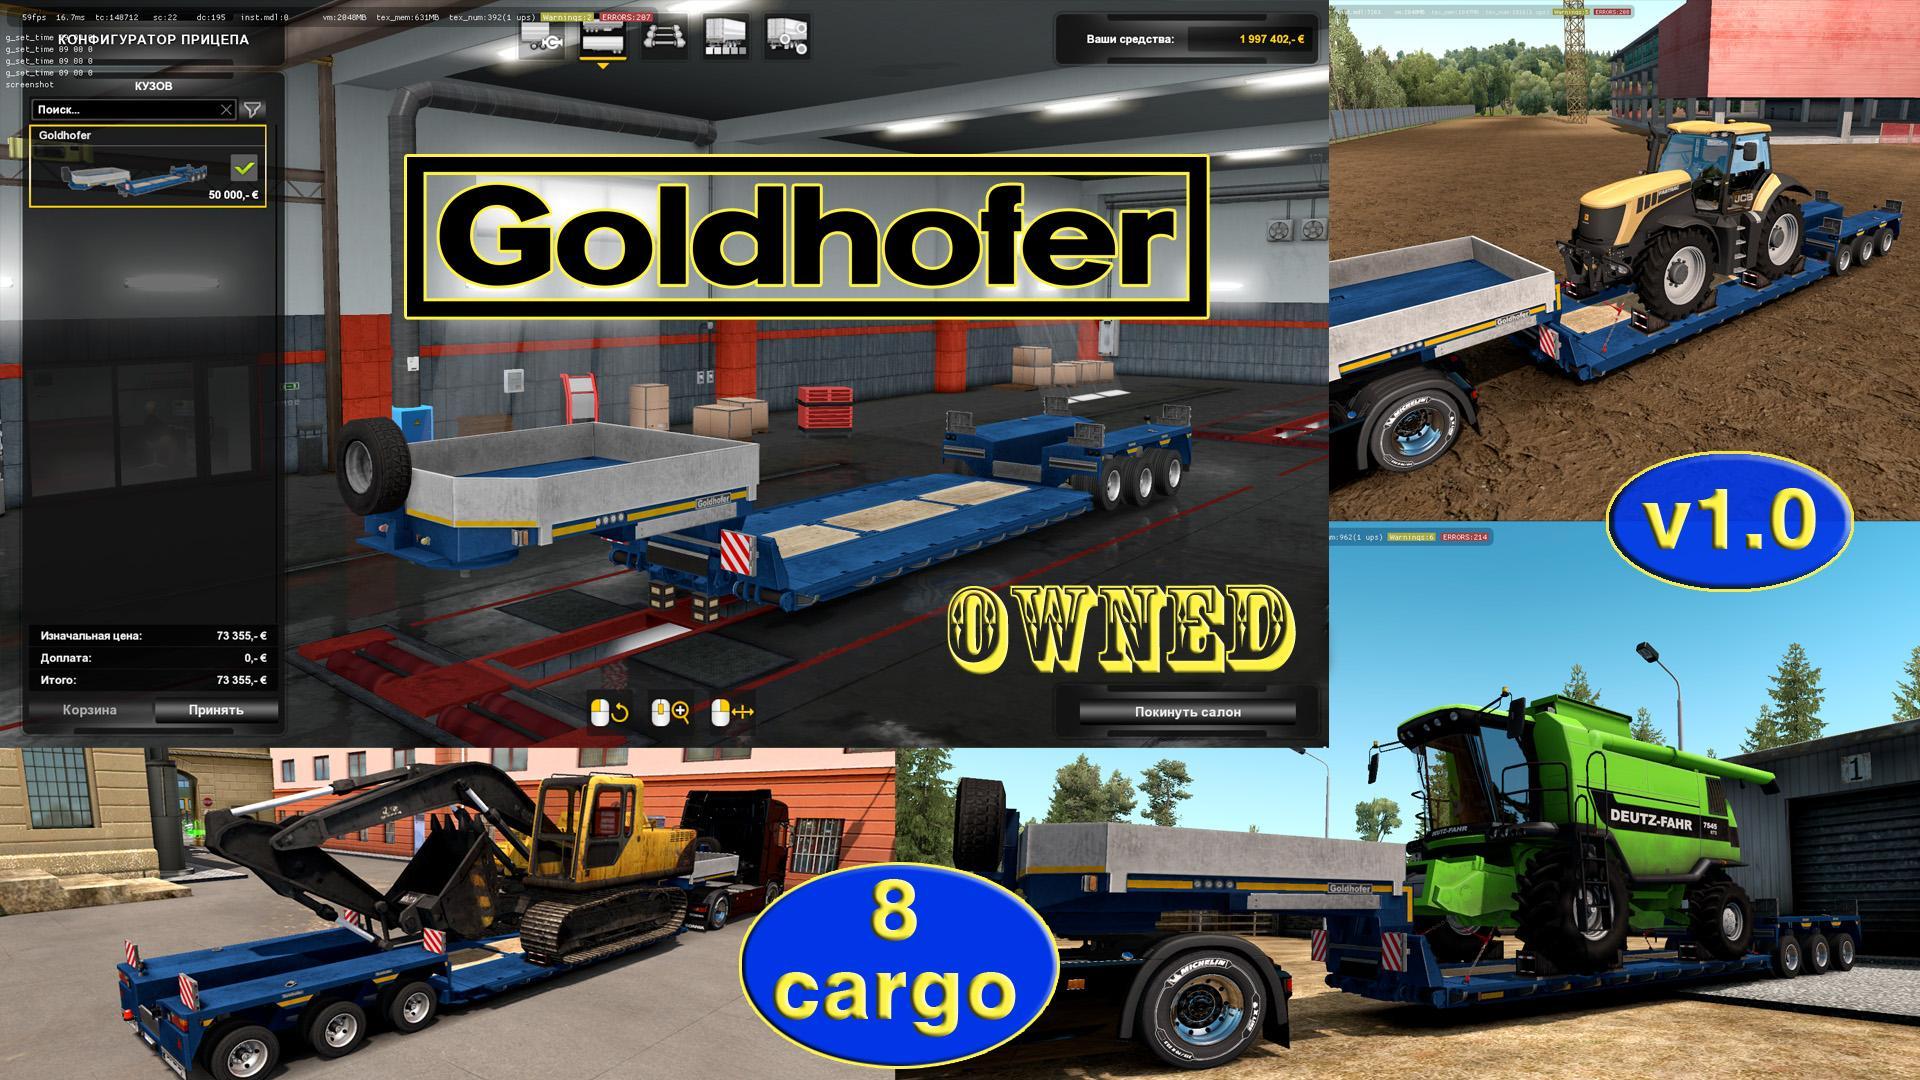 Ownable overweight trailer Goldhofer v1.0